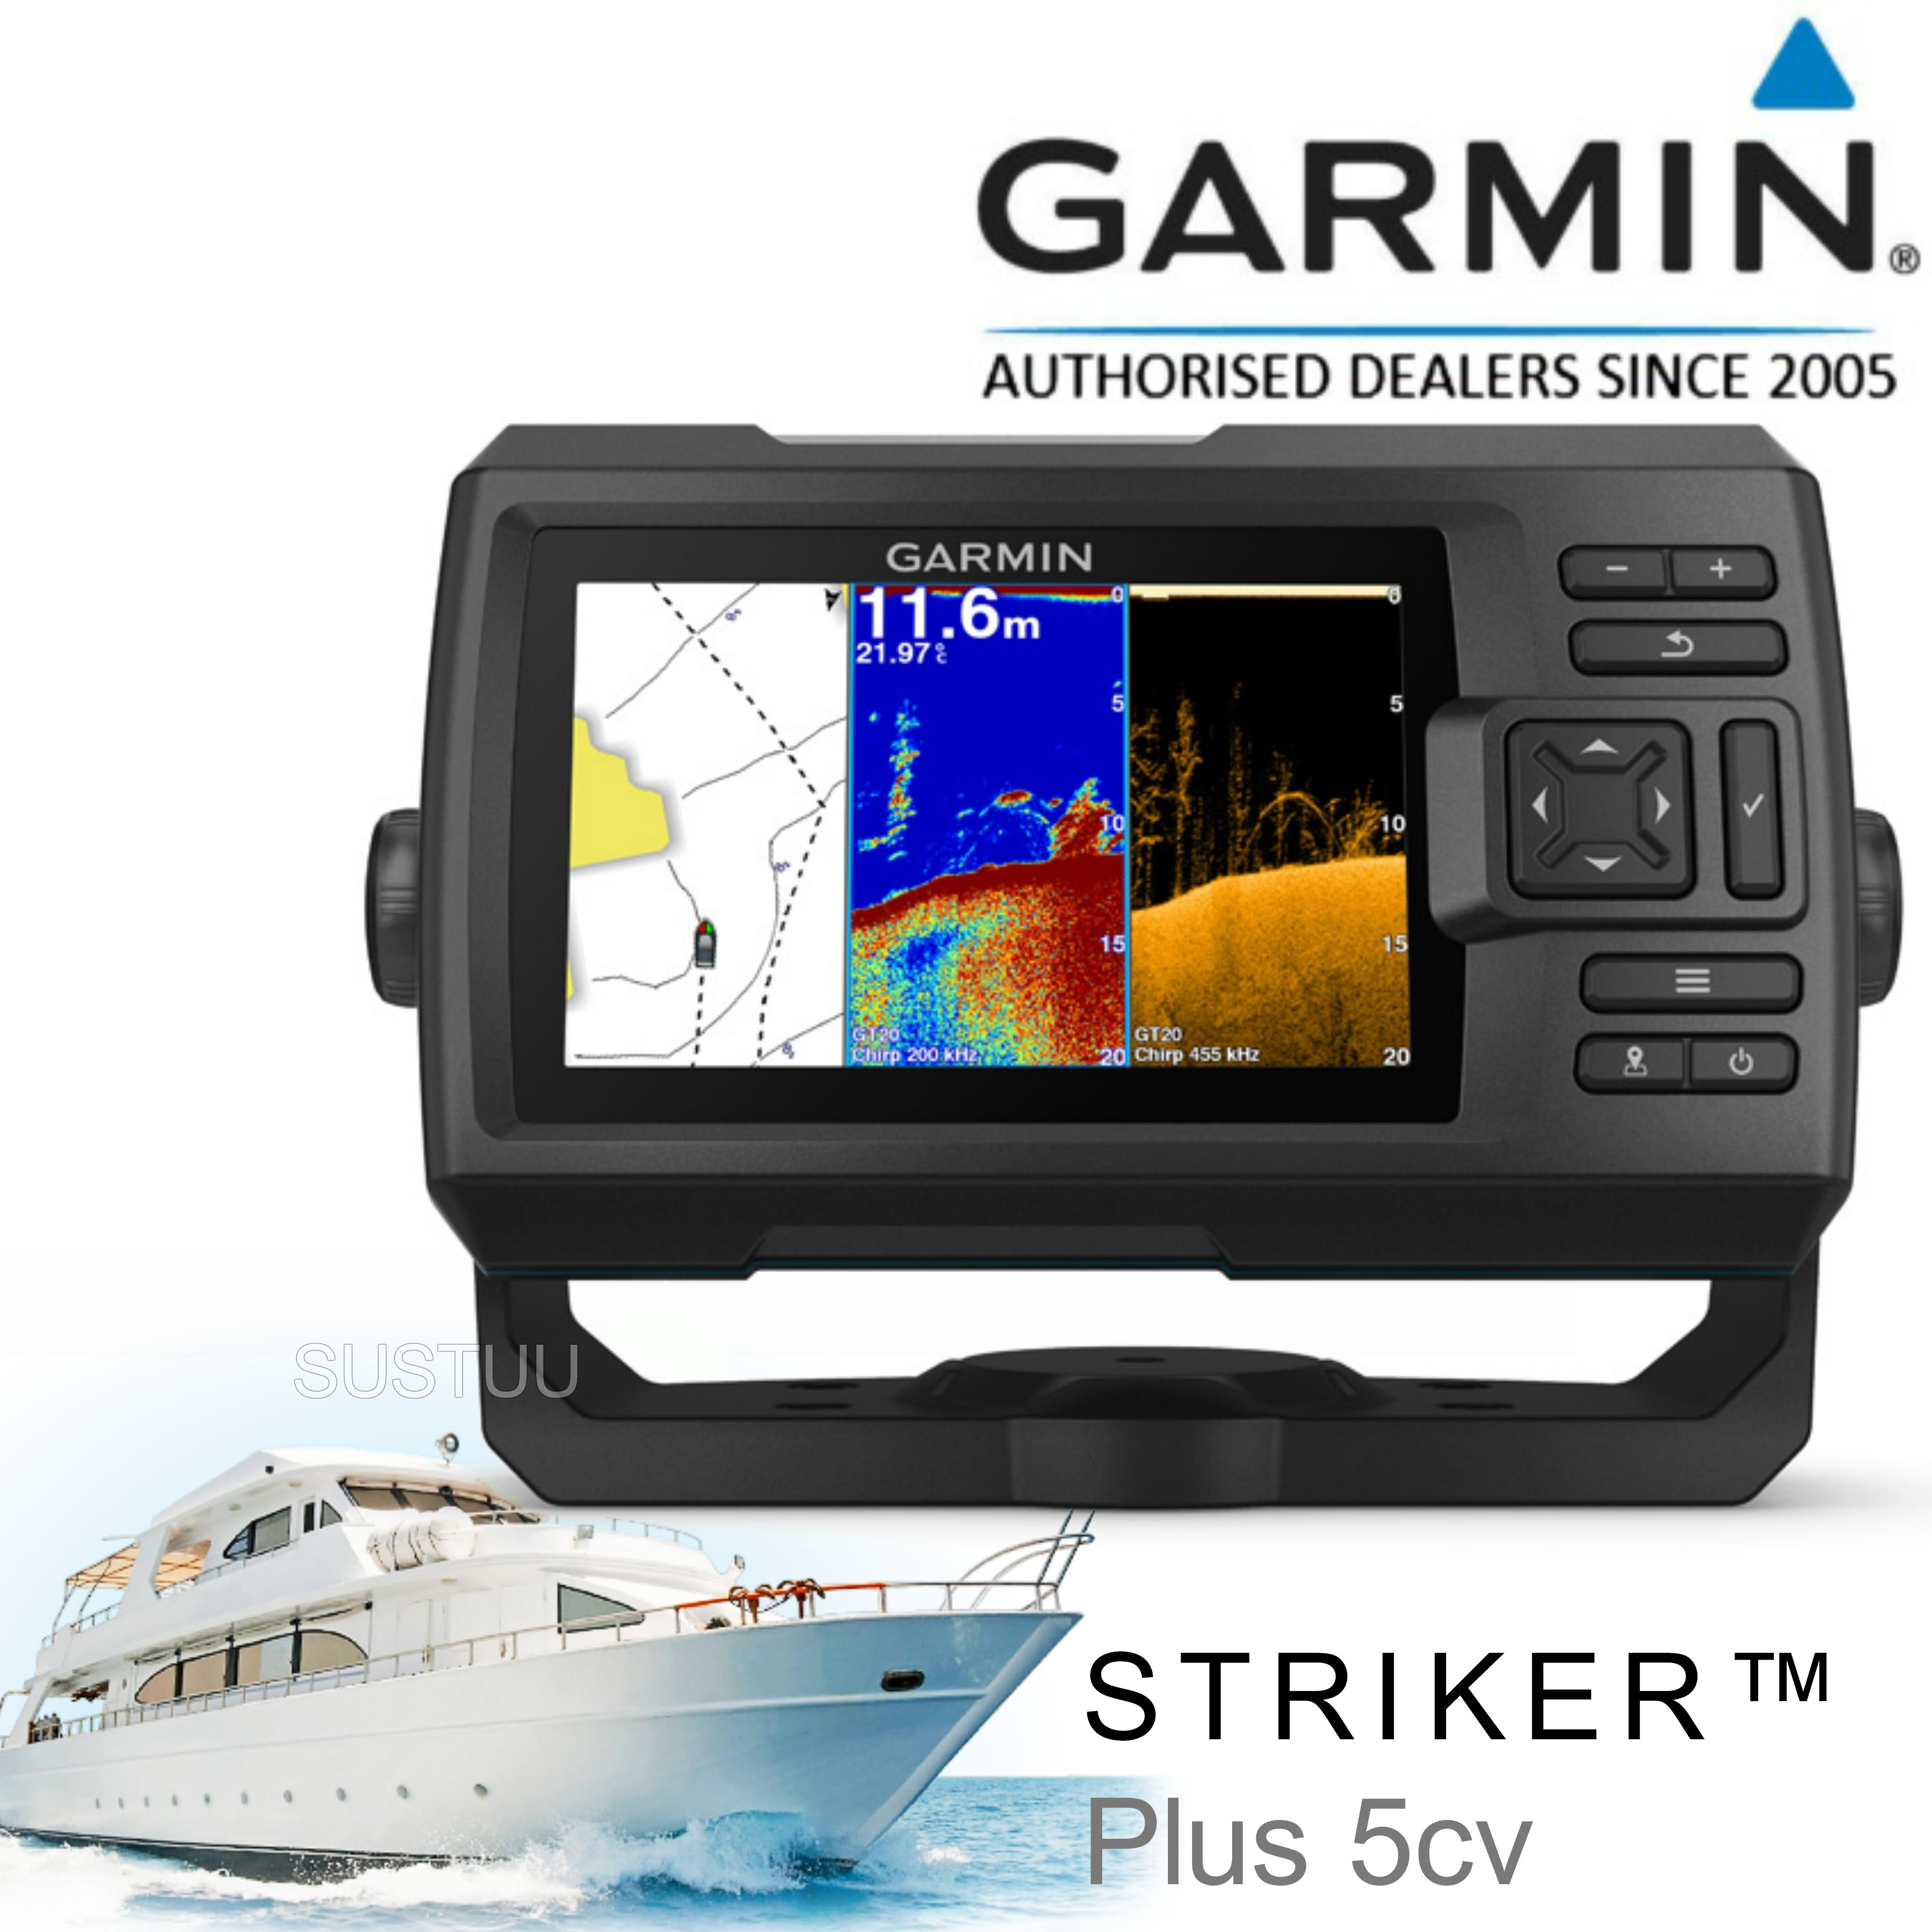 Garmin STRIKER Plus 5cv -5'' Display|Fish Finder|CHIRP sonar|GPS|ClearVü|IPX7|For Marine